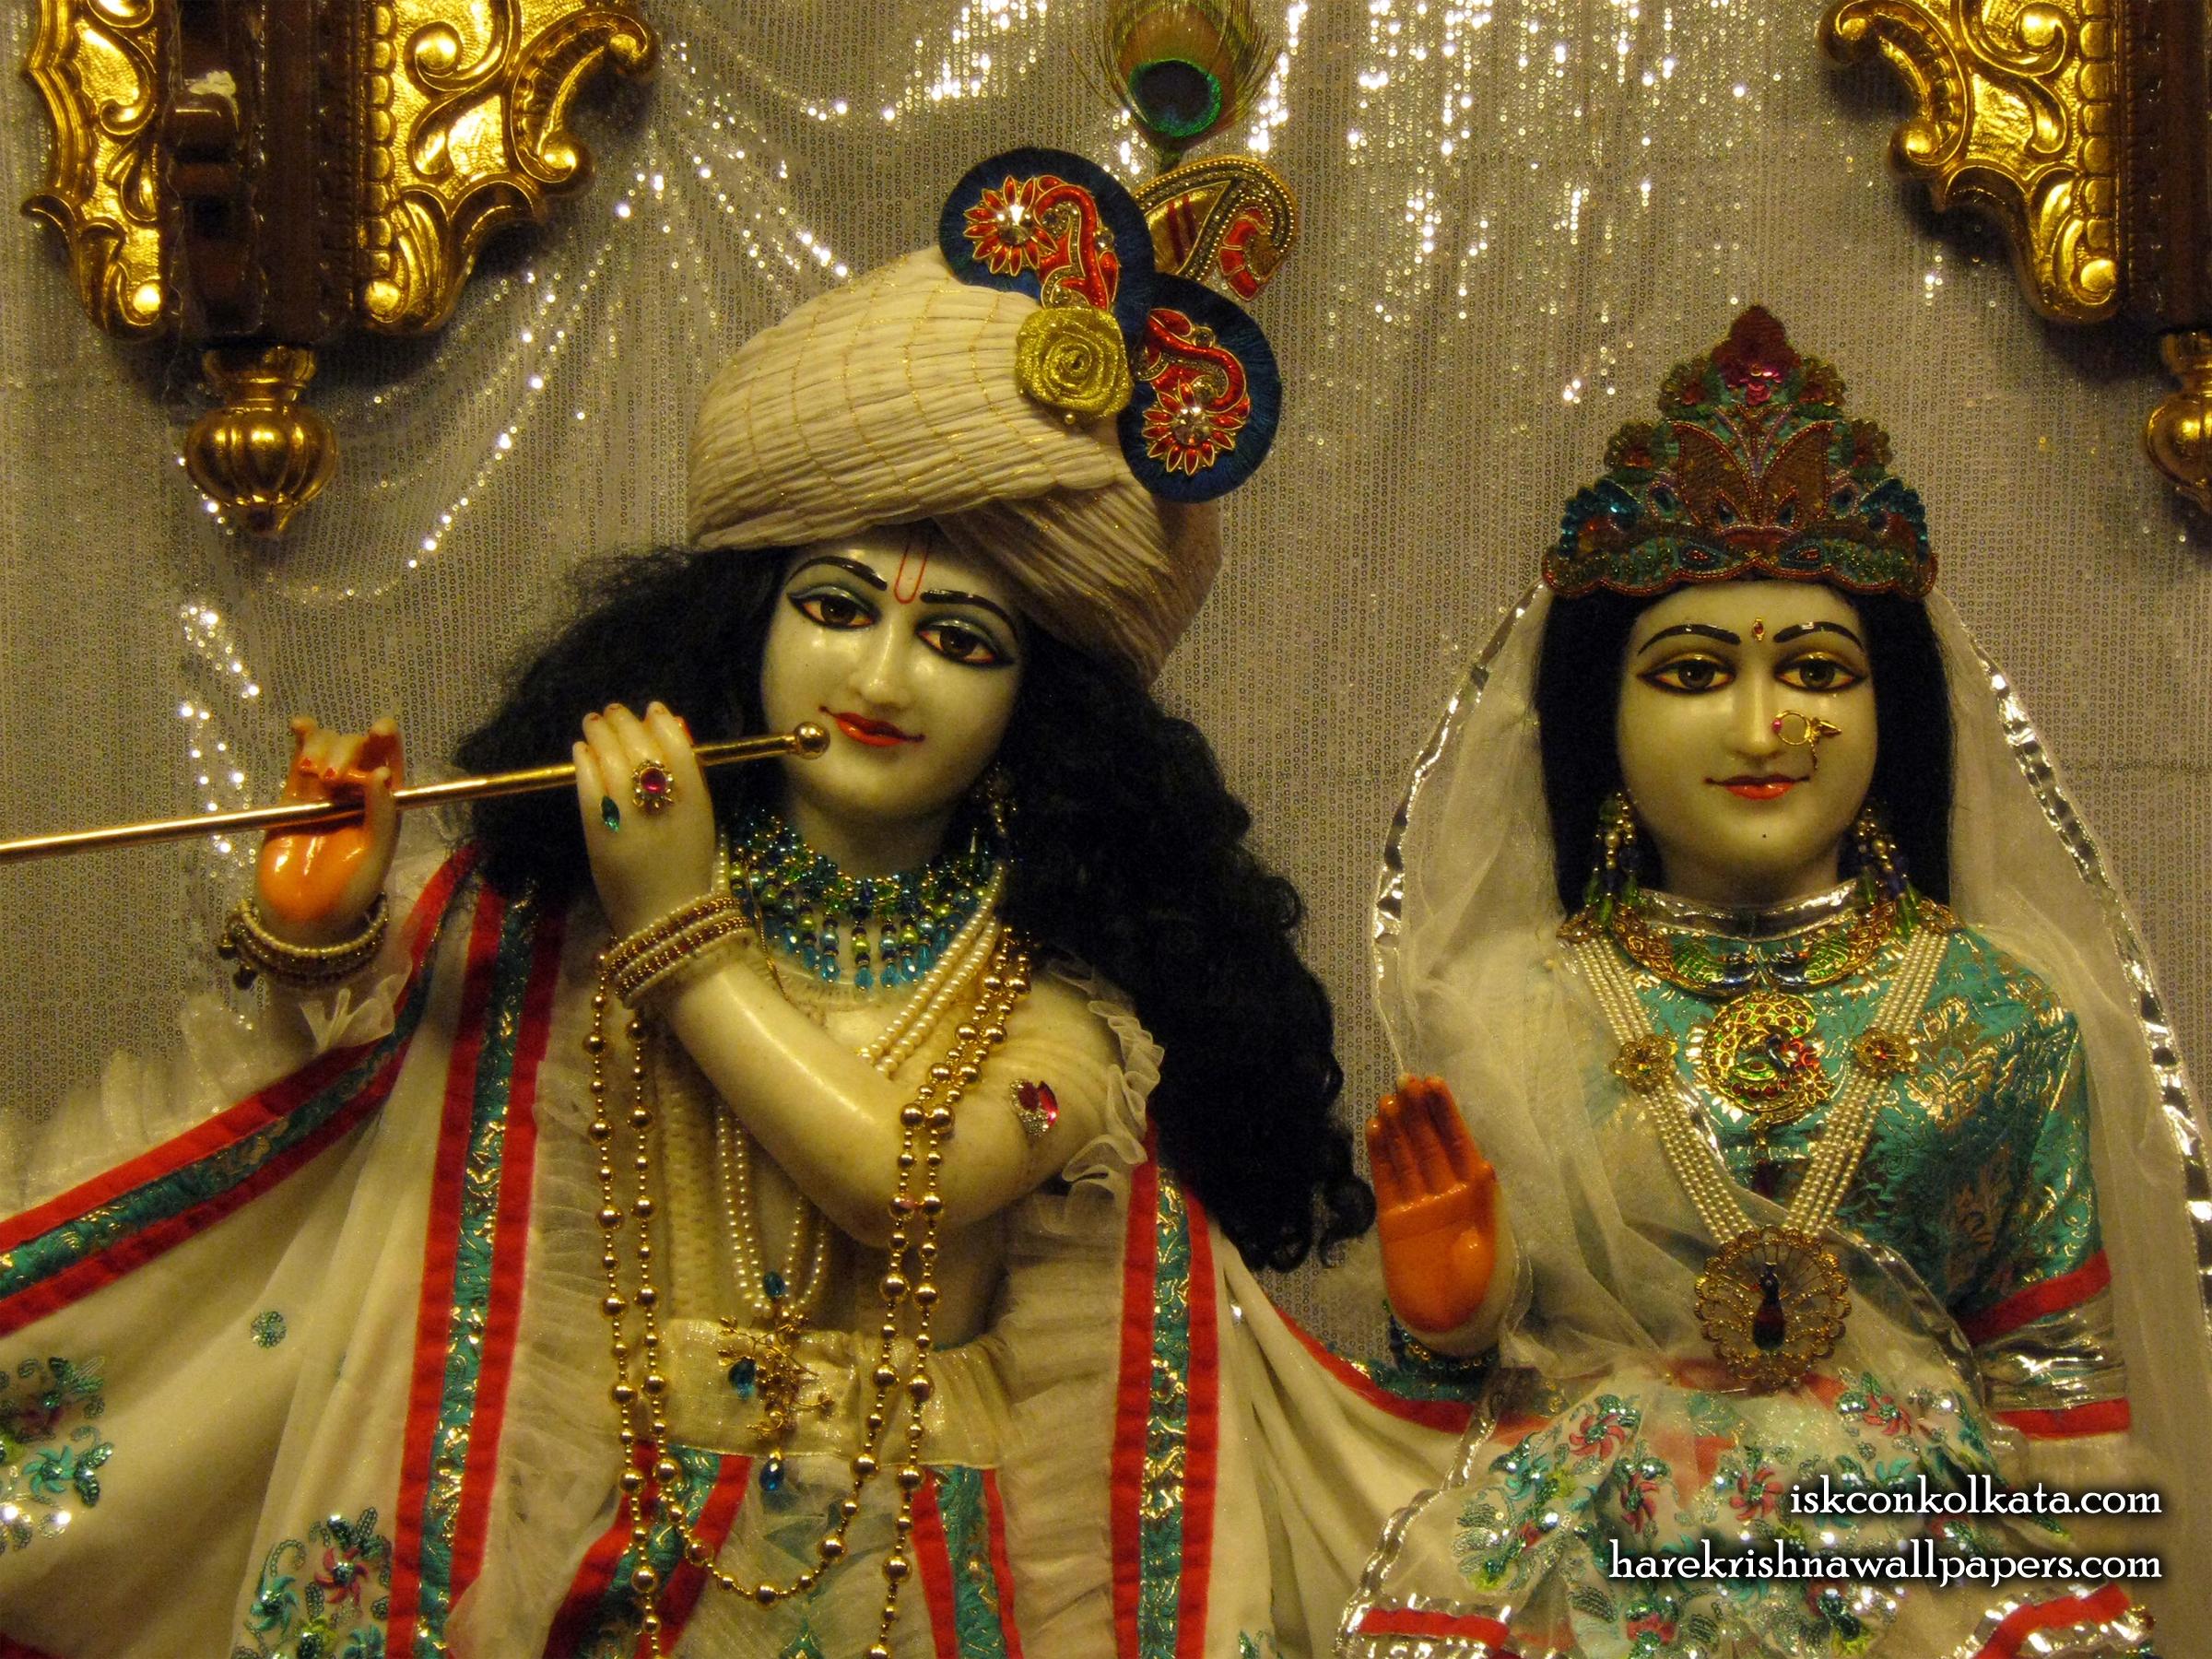 Sri Sri Radha Govinda Close up Wallpaper (003) Size 2400x1800 Download